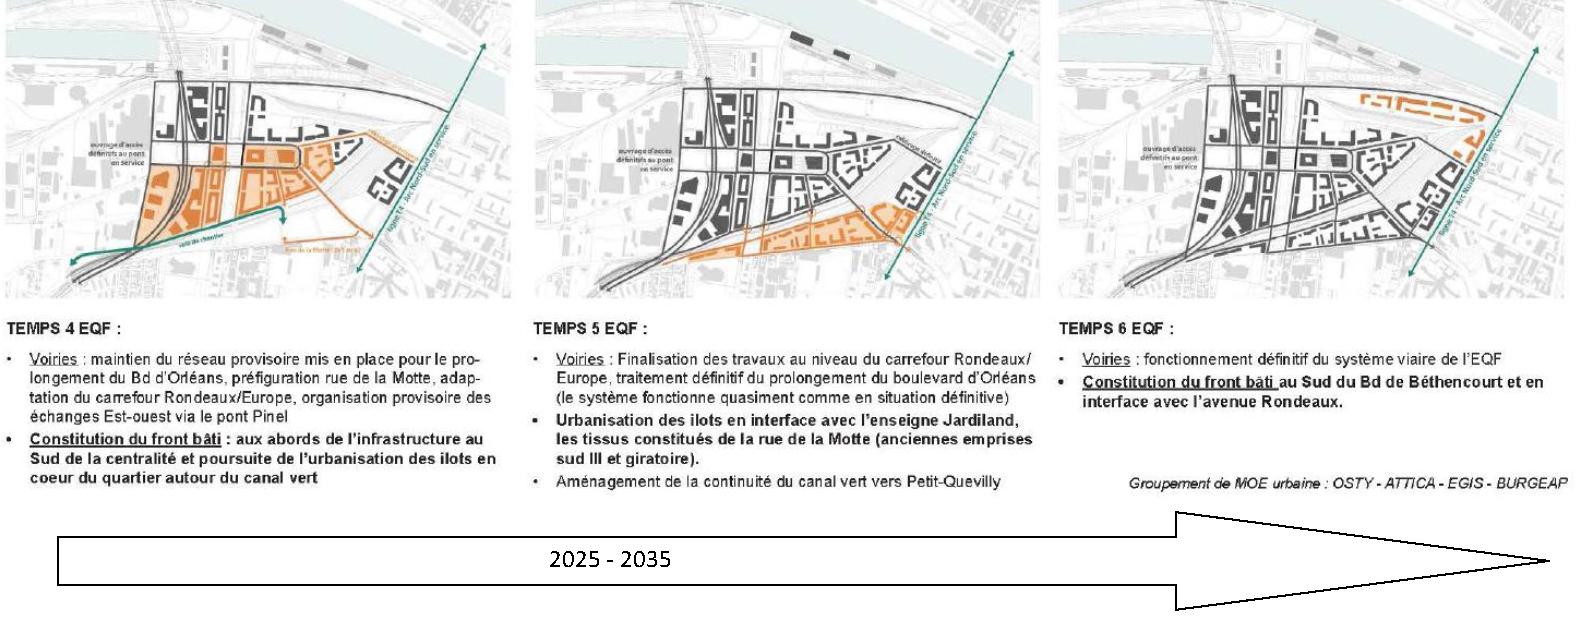 [Bientôt visible sur Google Earth] - Rouen - Ecoquartier Flaubert Ph210